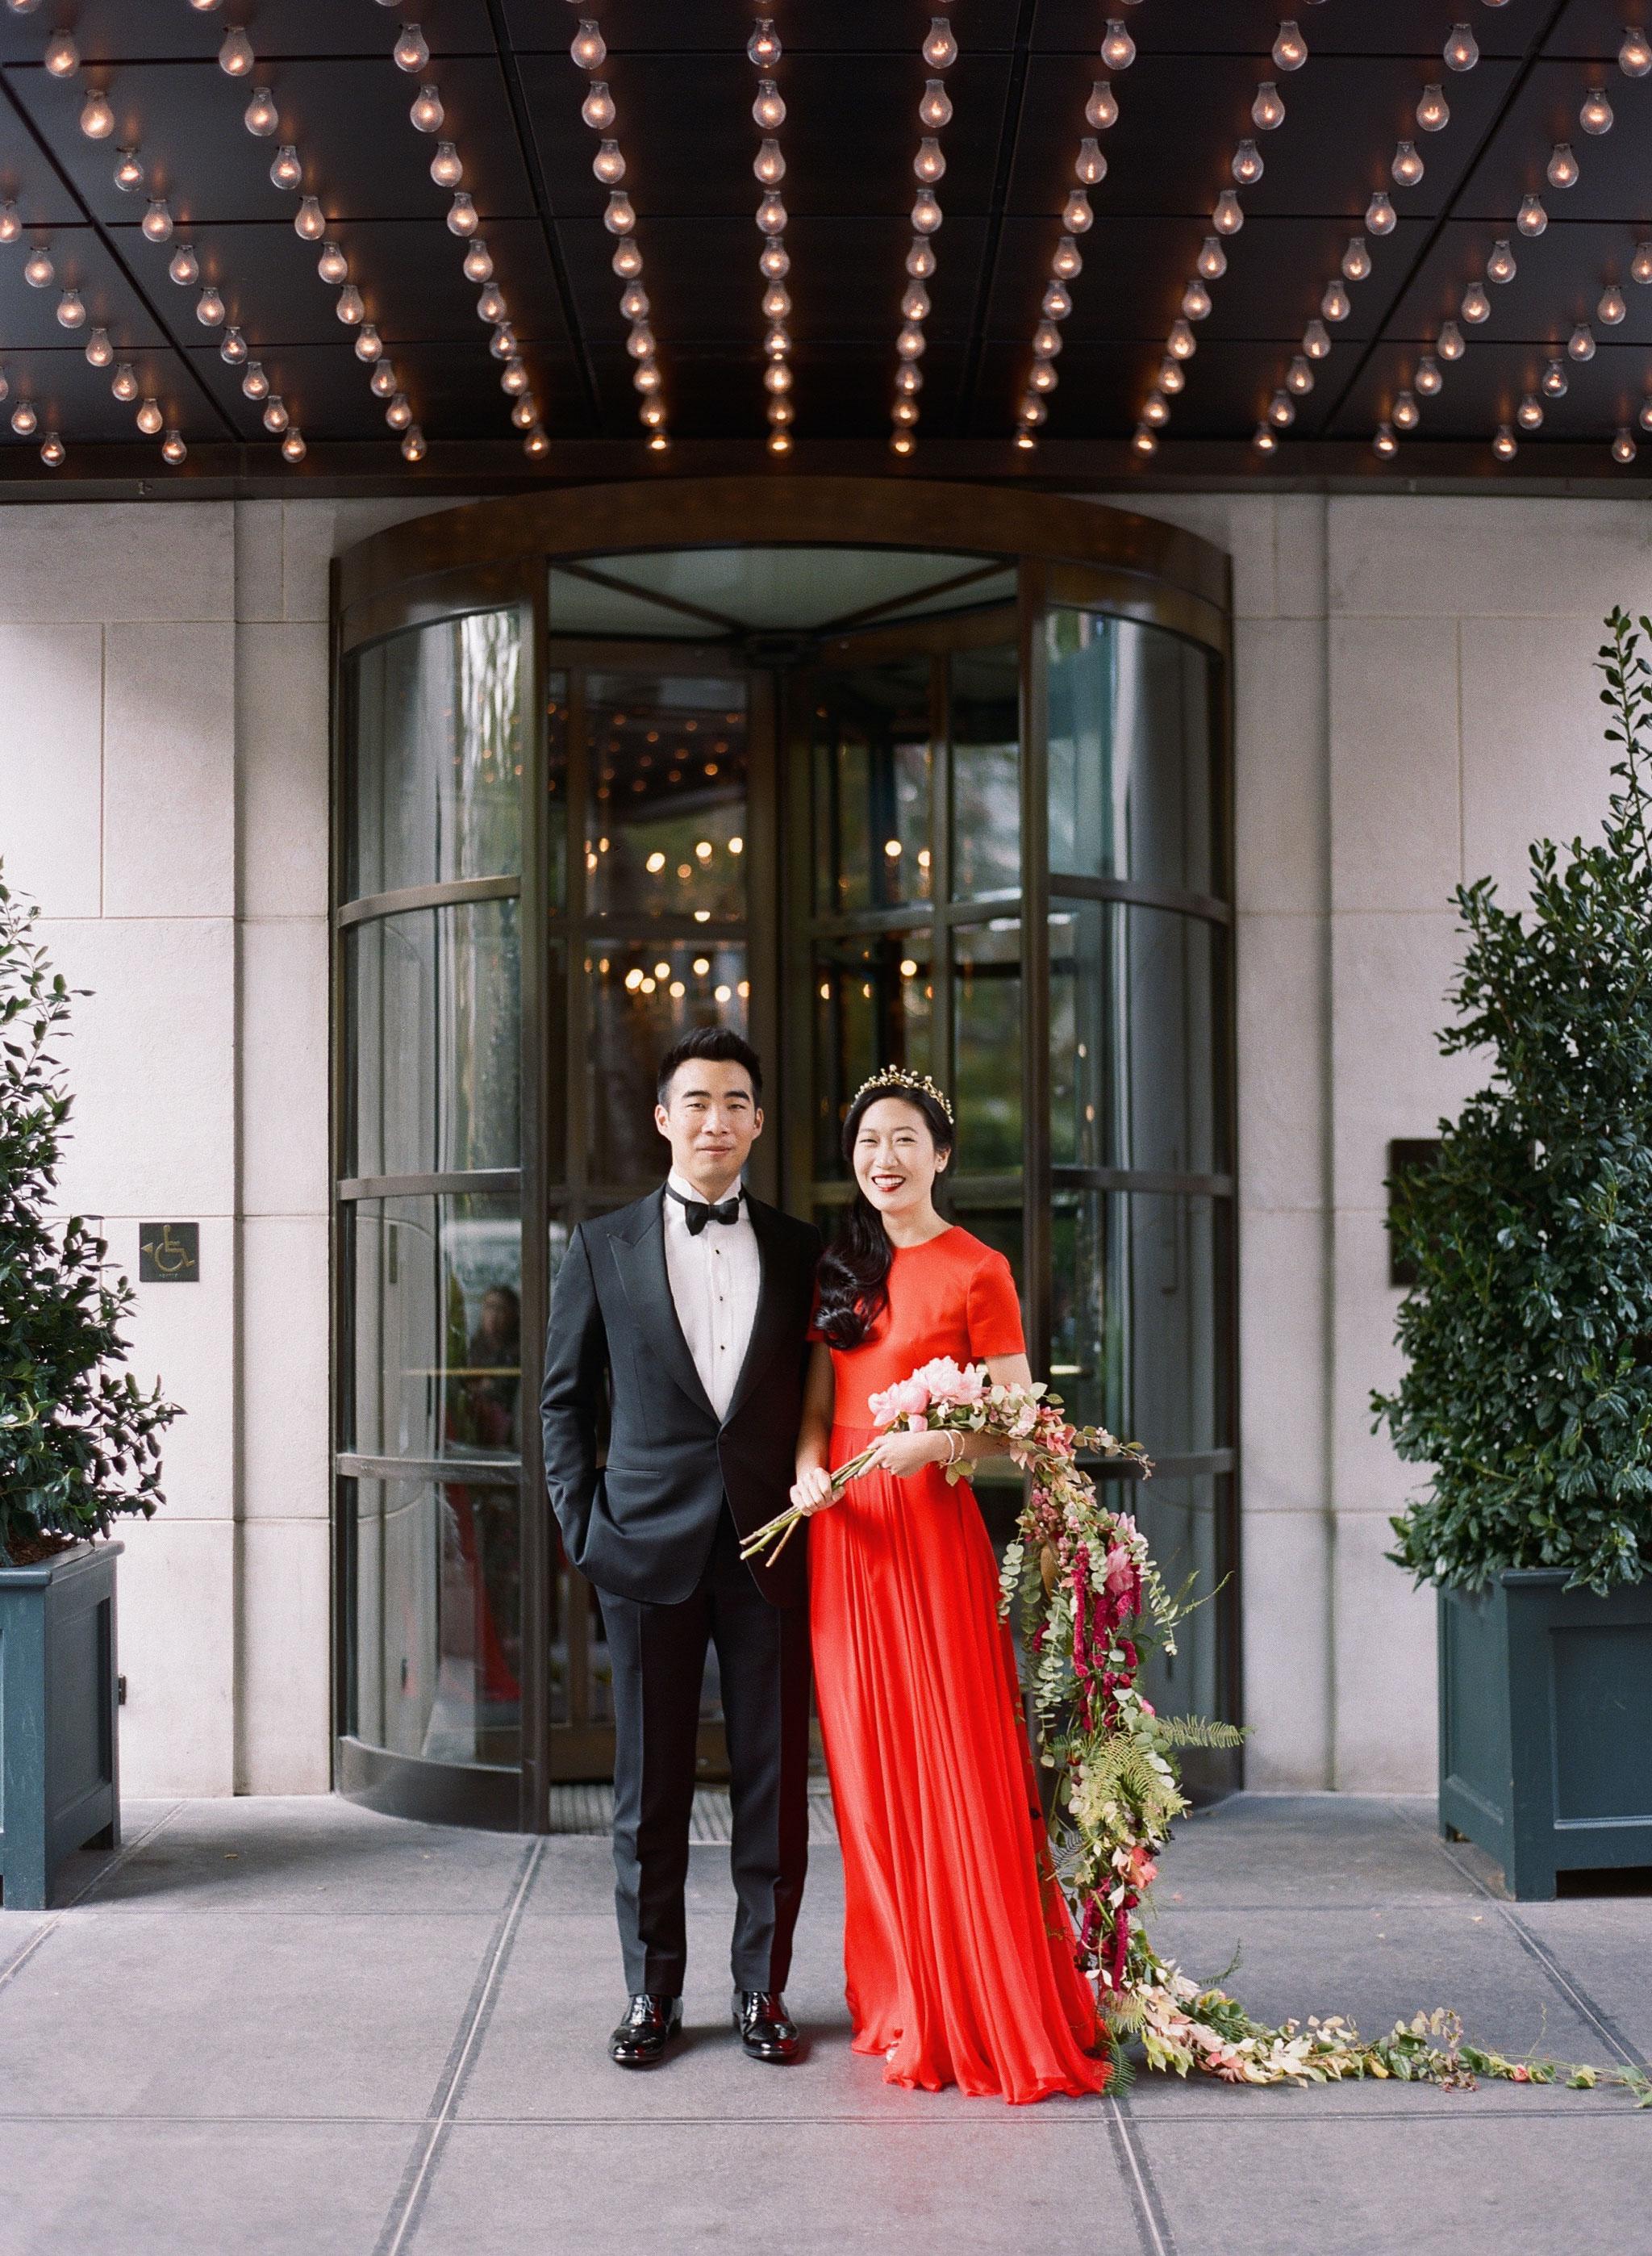 glara matthew wedding couple